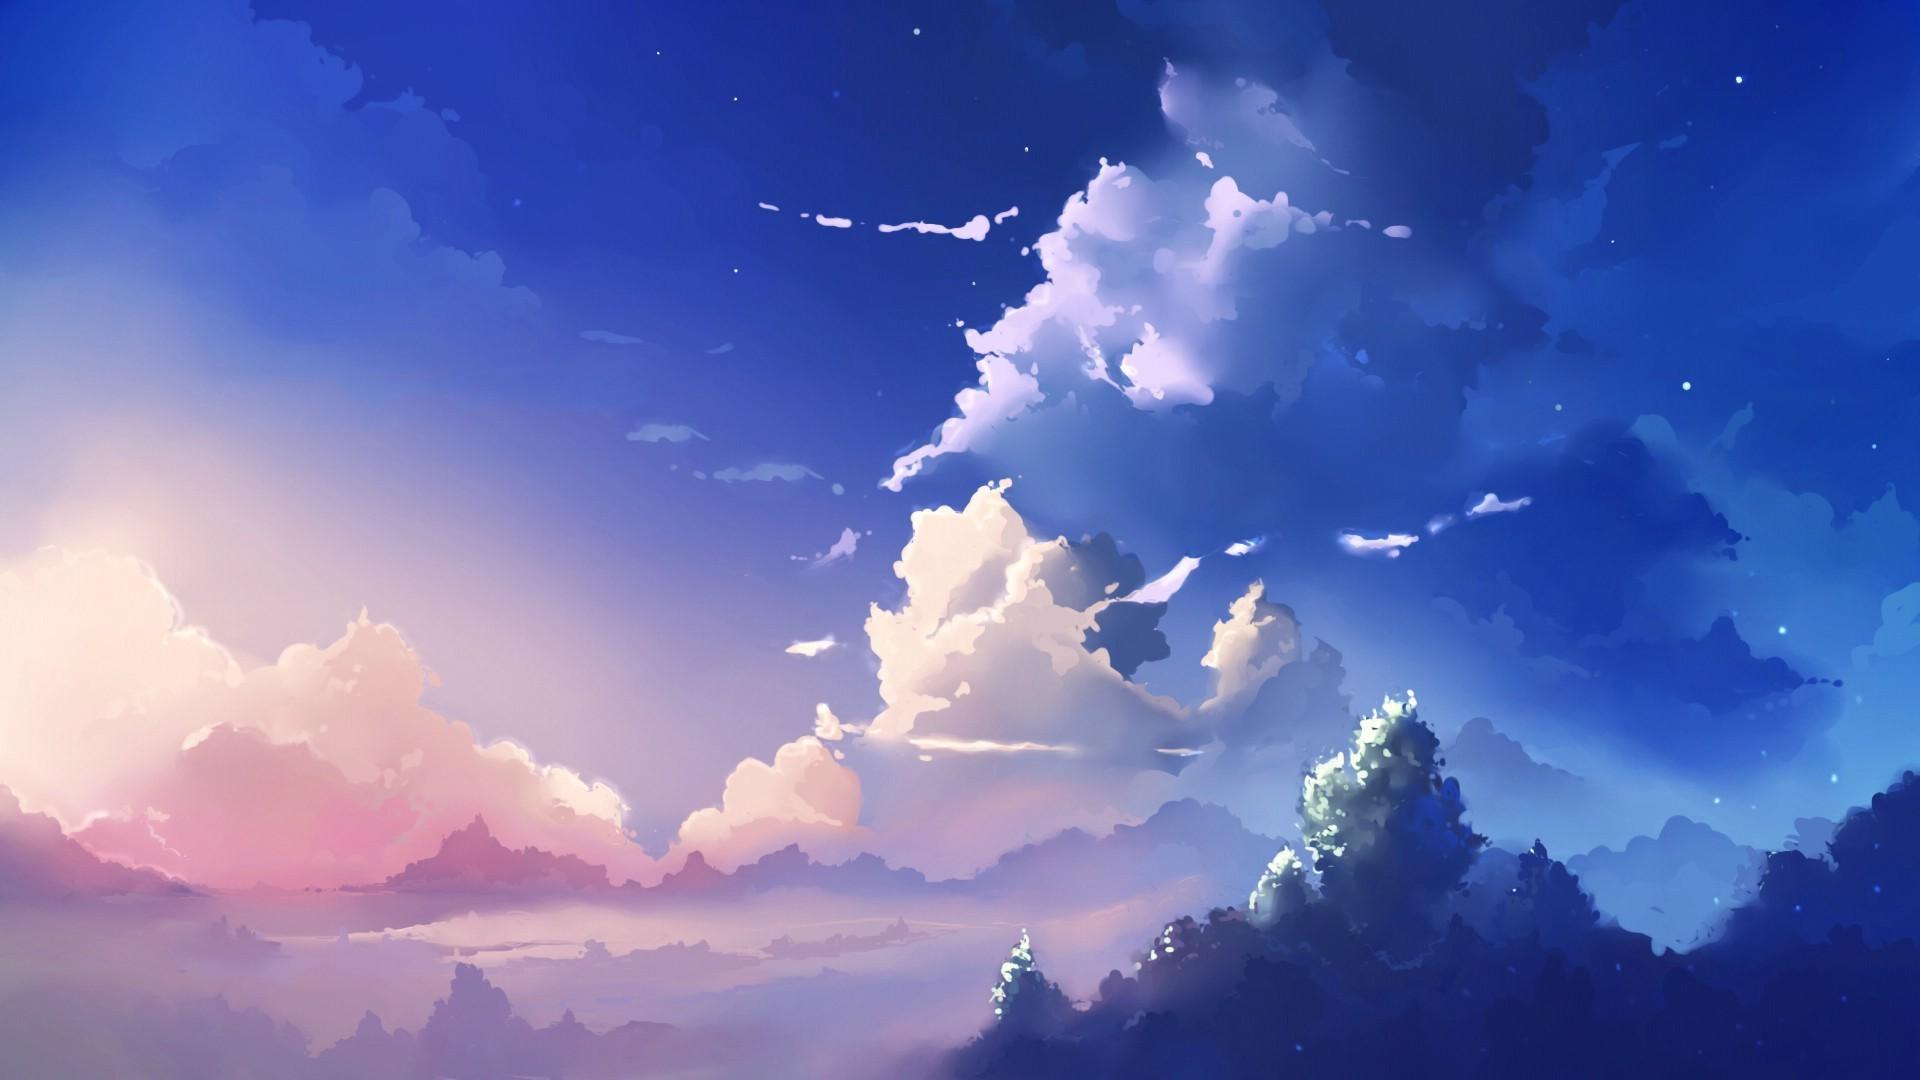 Anime Scenery Wallpaper Background ~ Sdeerwallpaper